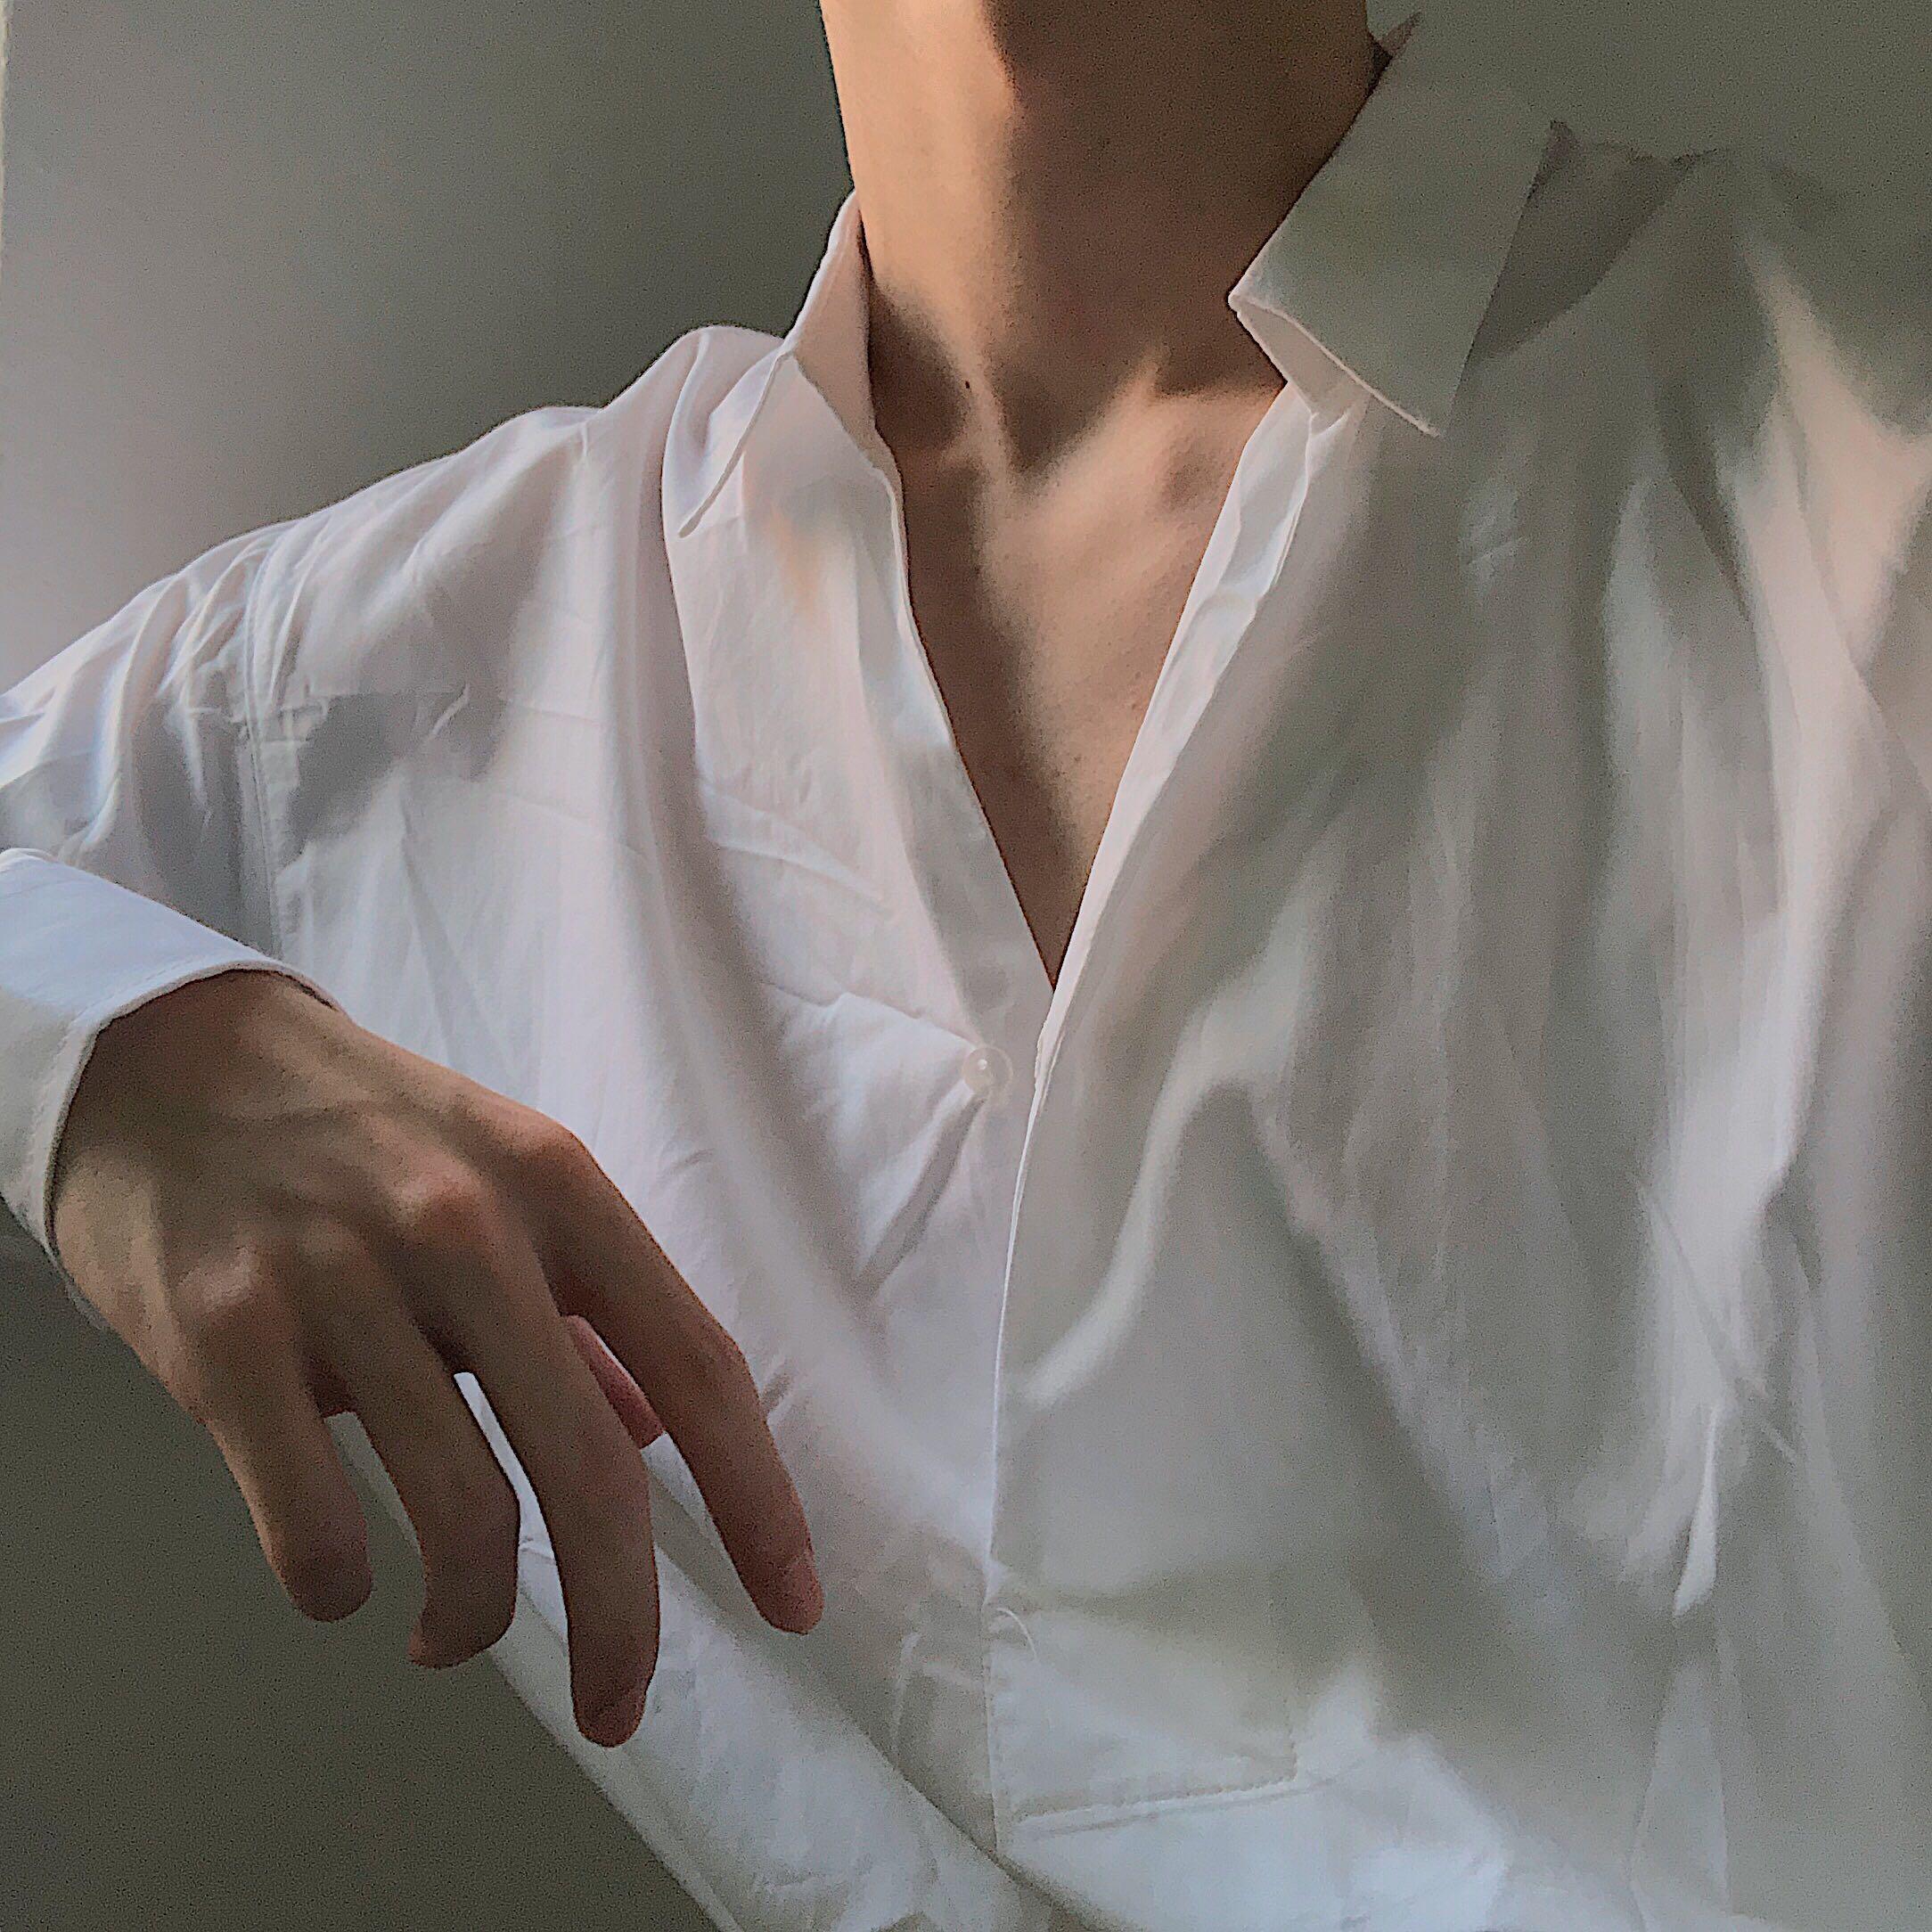 Coln 让人欲罢不能的禁欲系V领套头衬衫只推荐给最有腔调的你